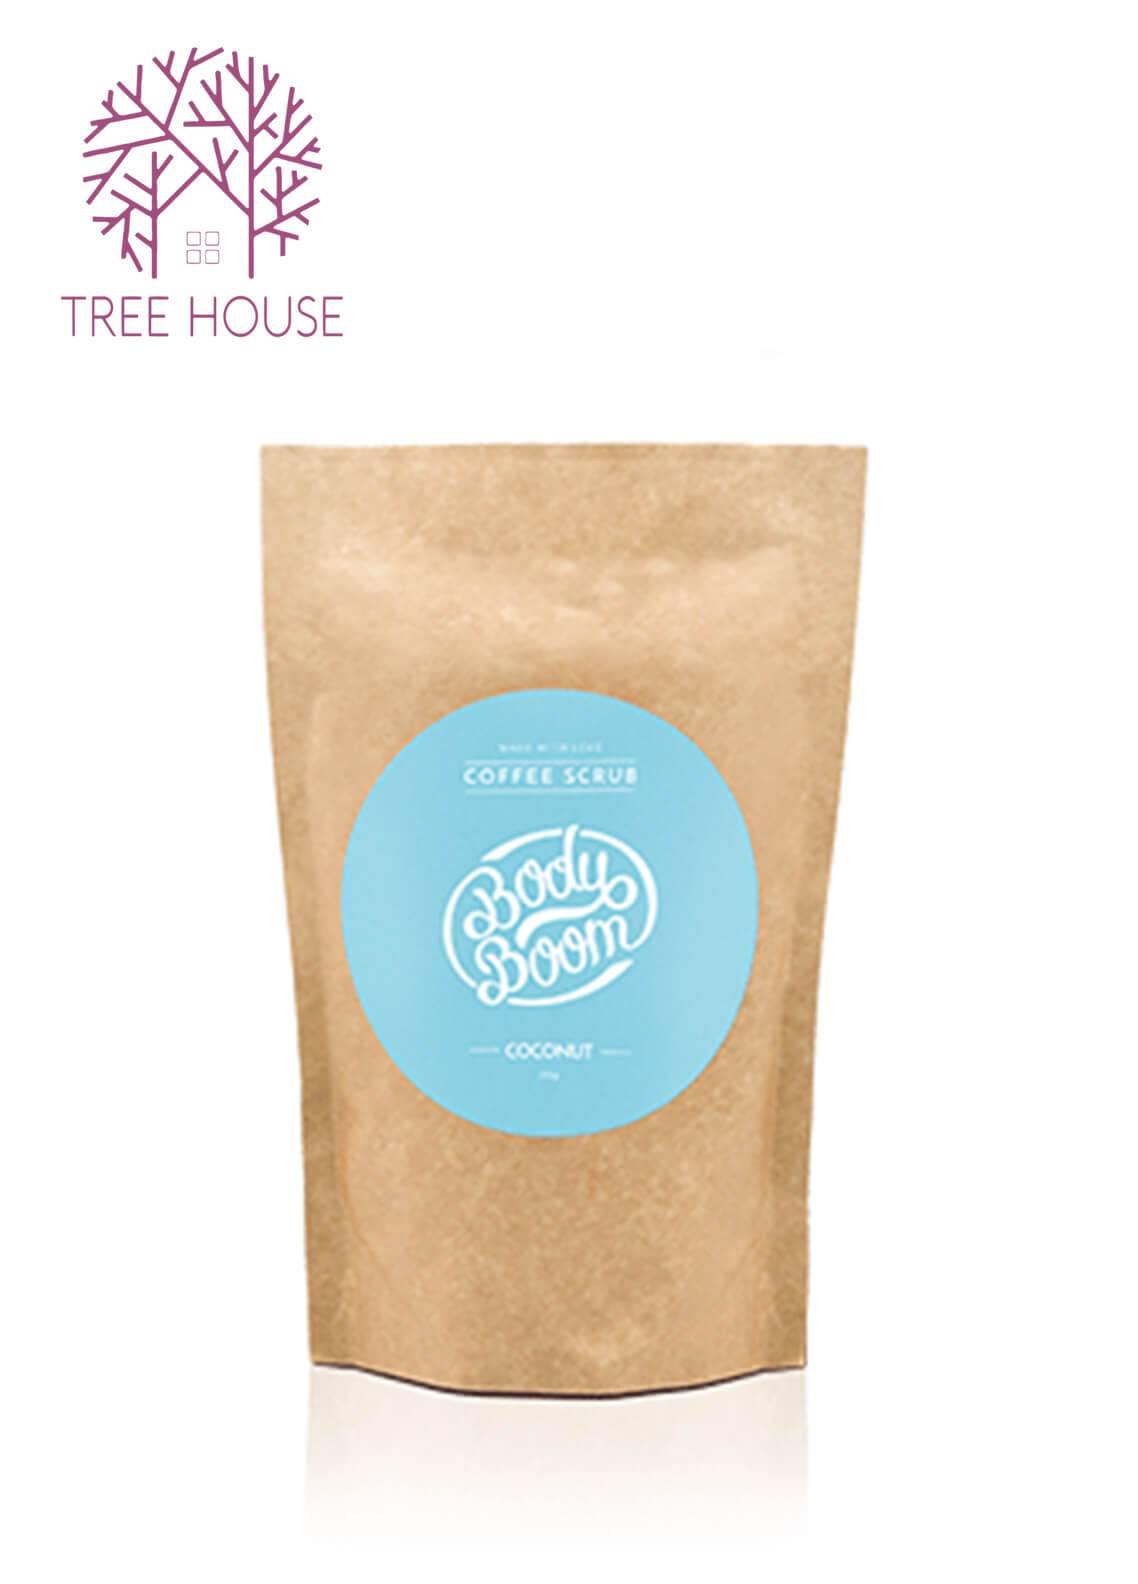 Body Boom Coffee Scrub (Coconut Flavour)